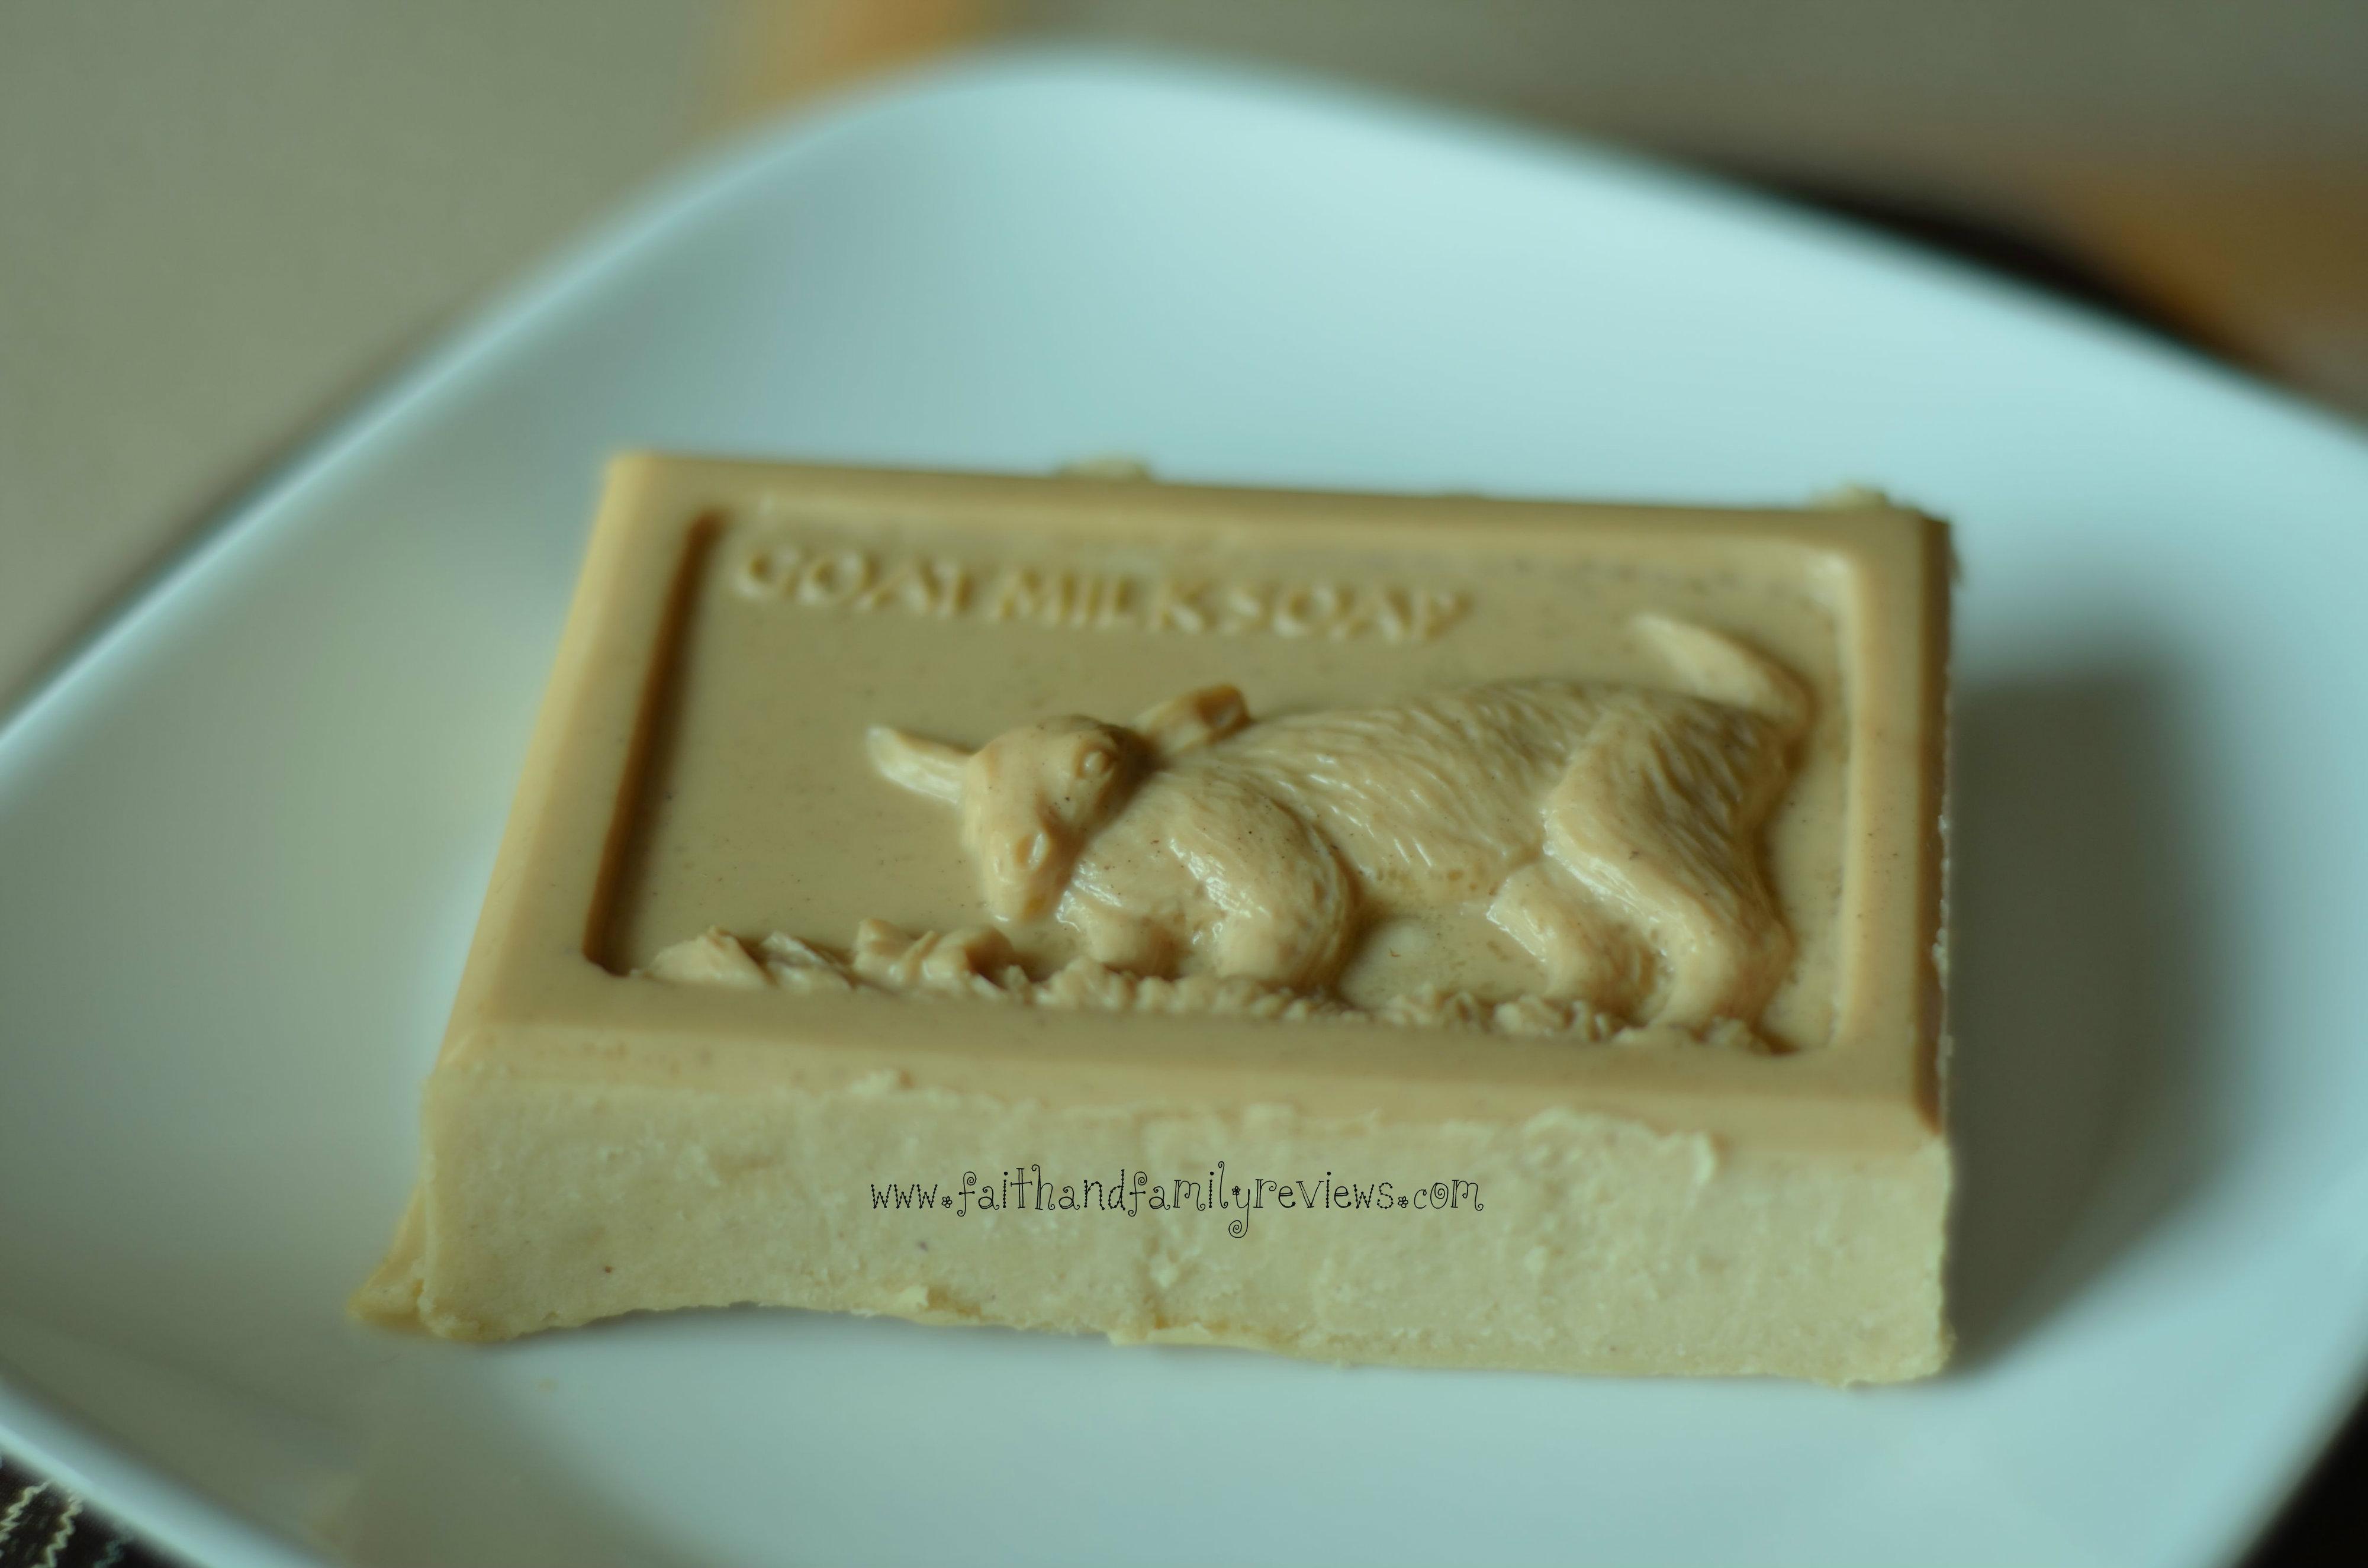 FFR Goat Milk Soap Baby